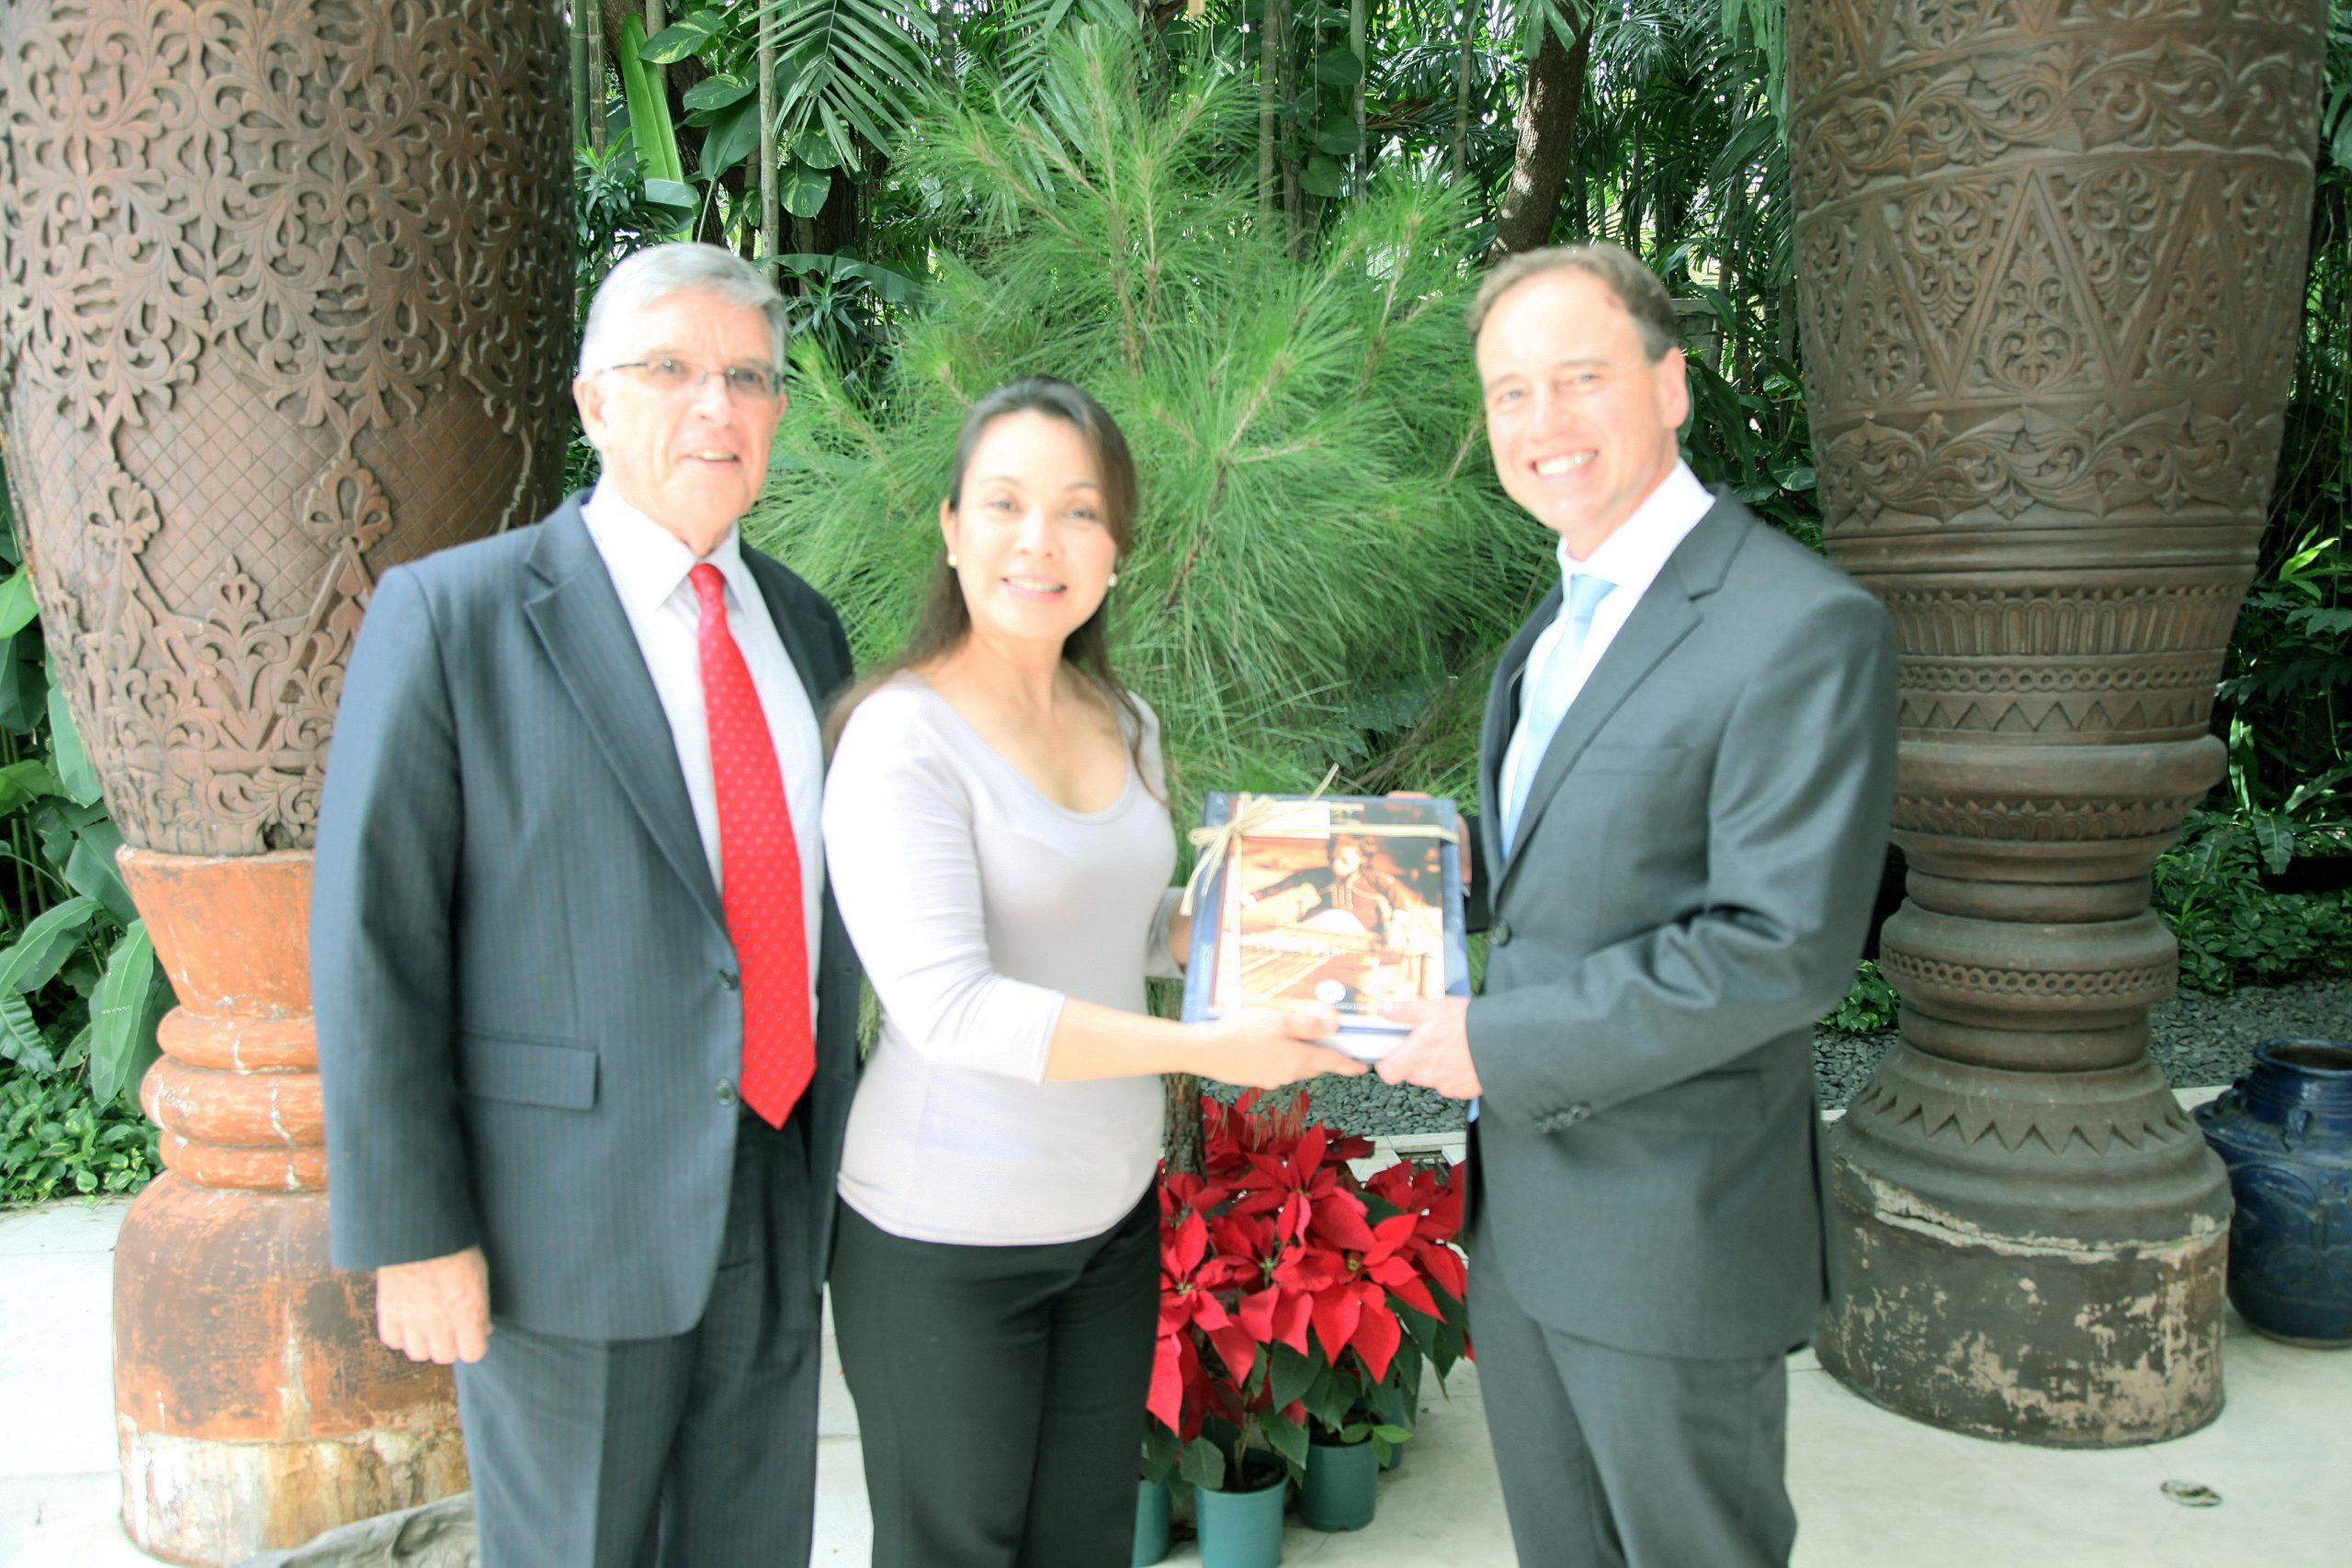 Senator Legarda meets with AU Environment Minister Greg Hunt and AU Ambassador Bill Tweddell